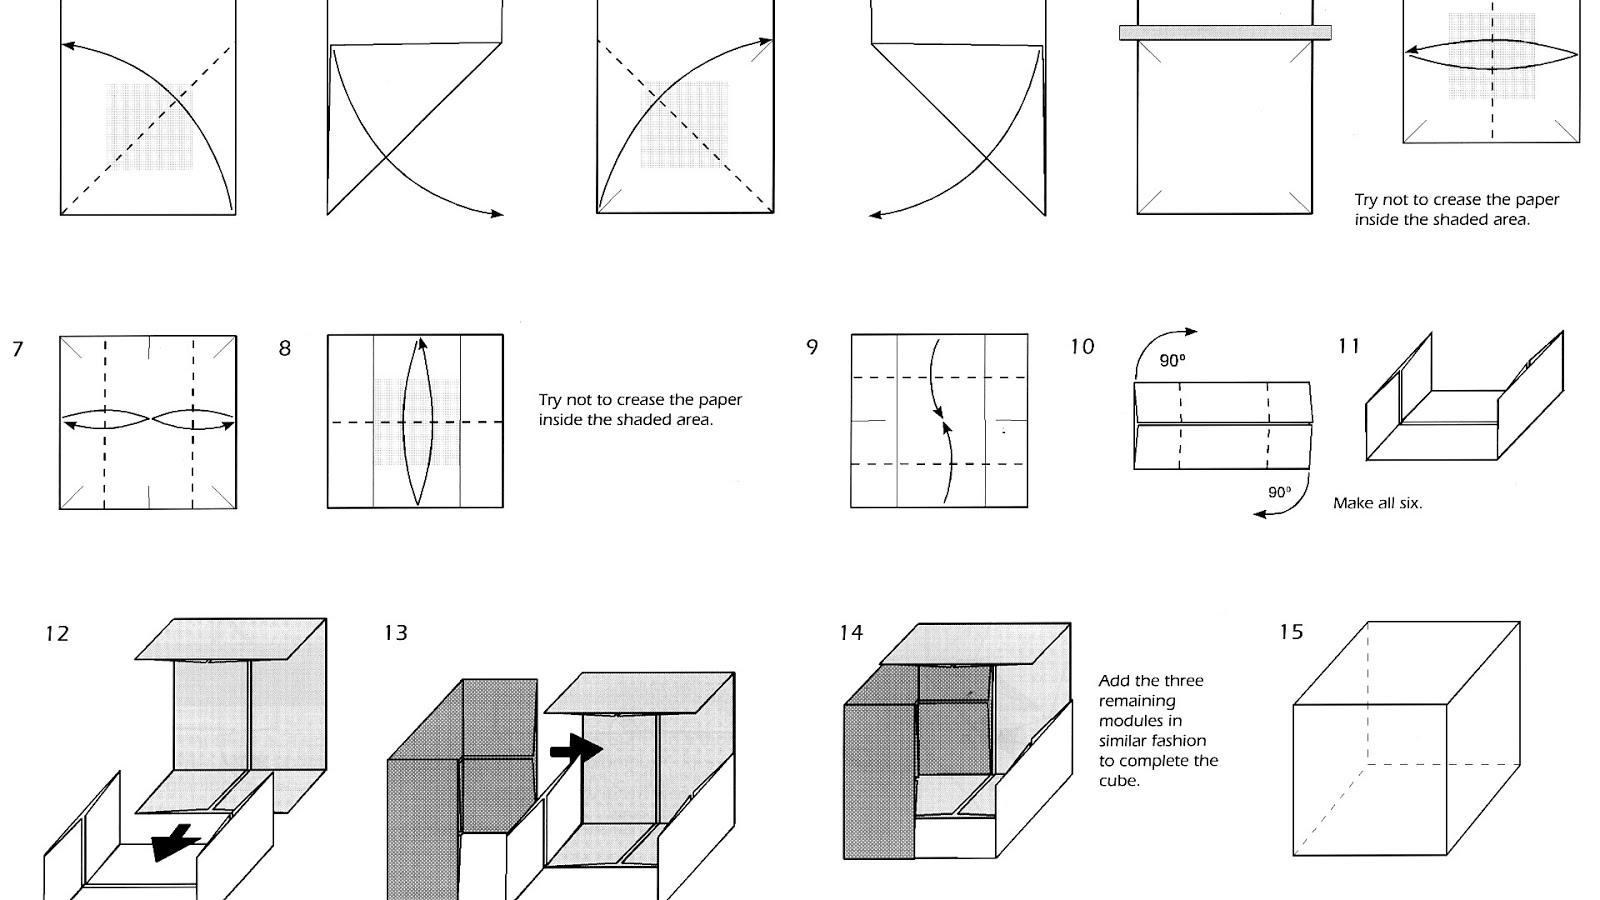 Tamatebako Box Origami Instructions